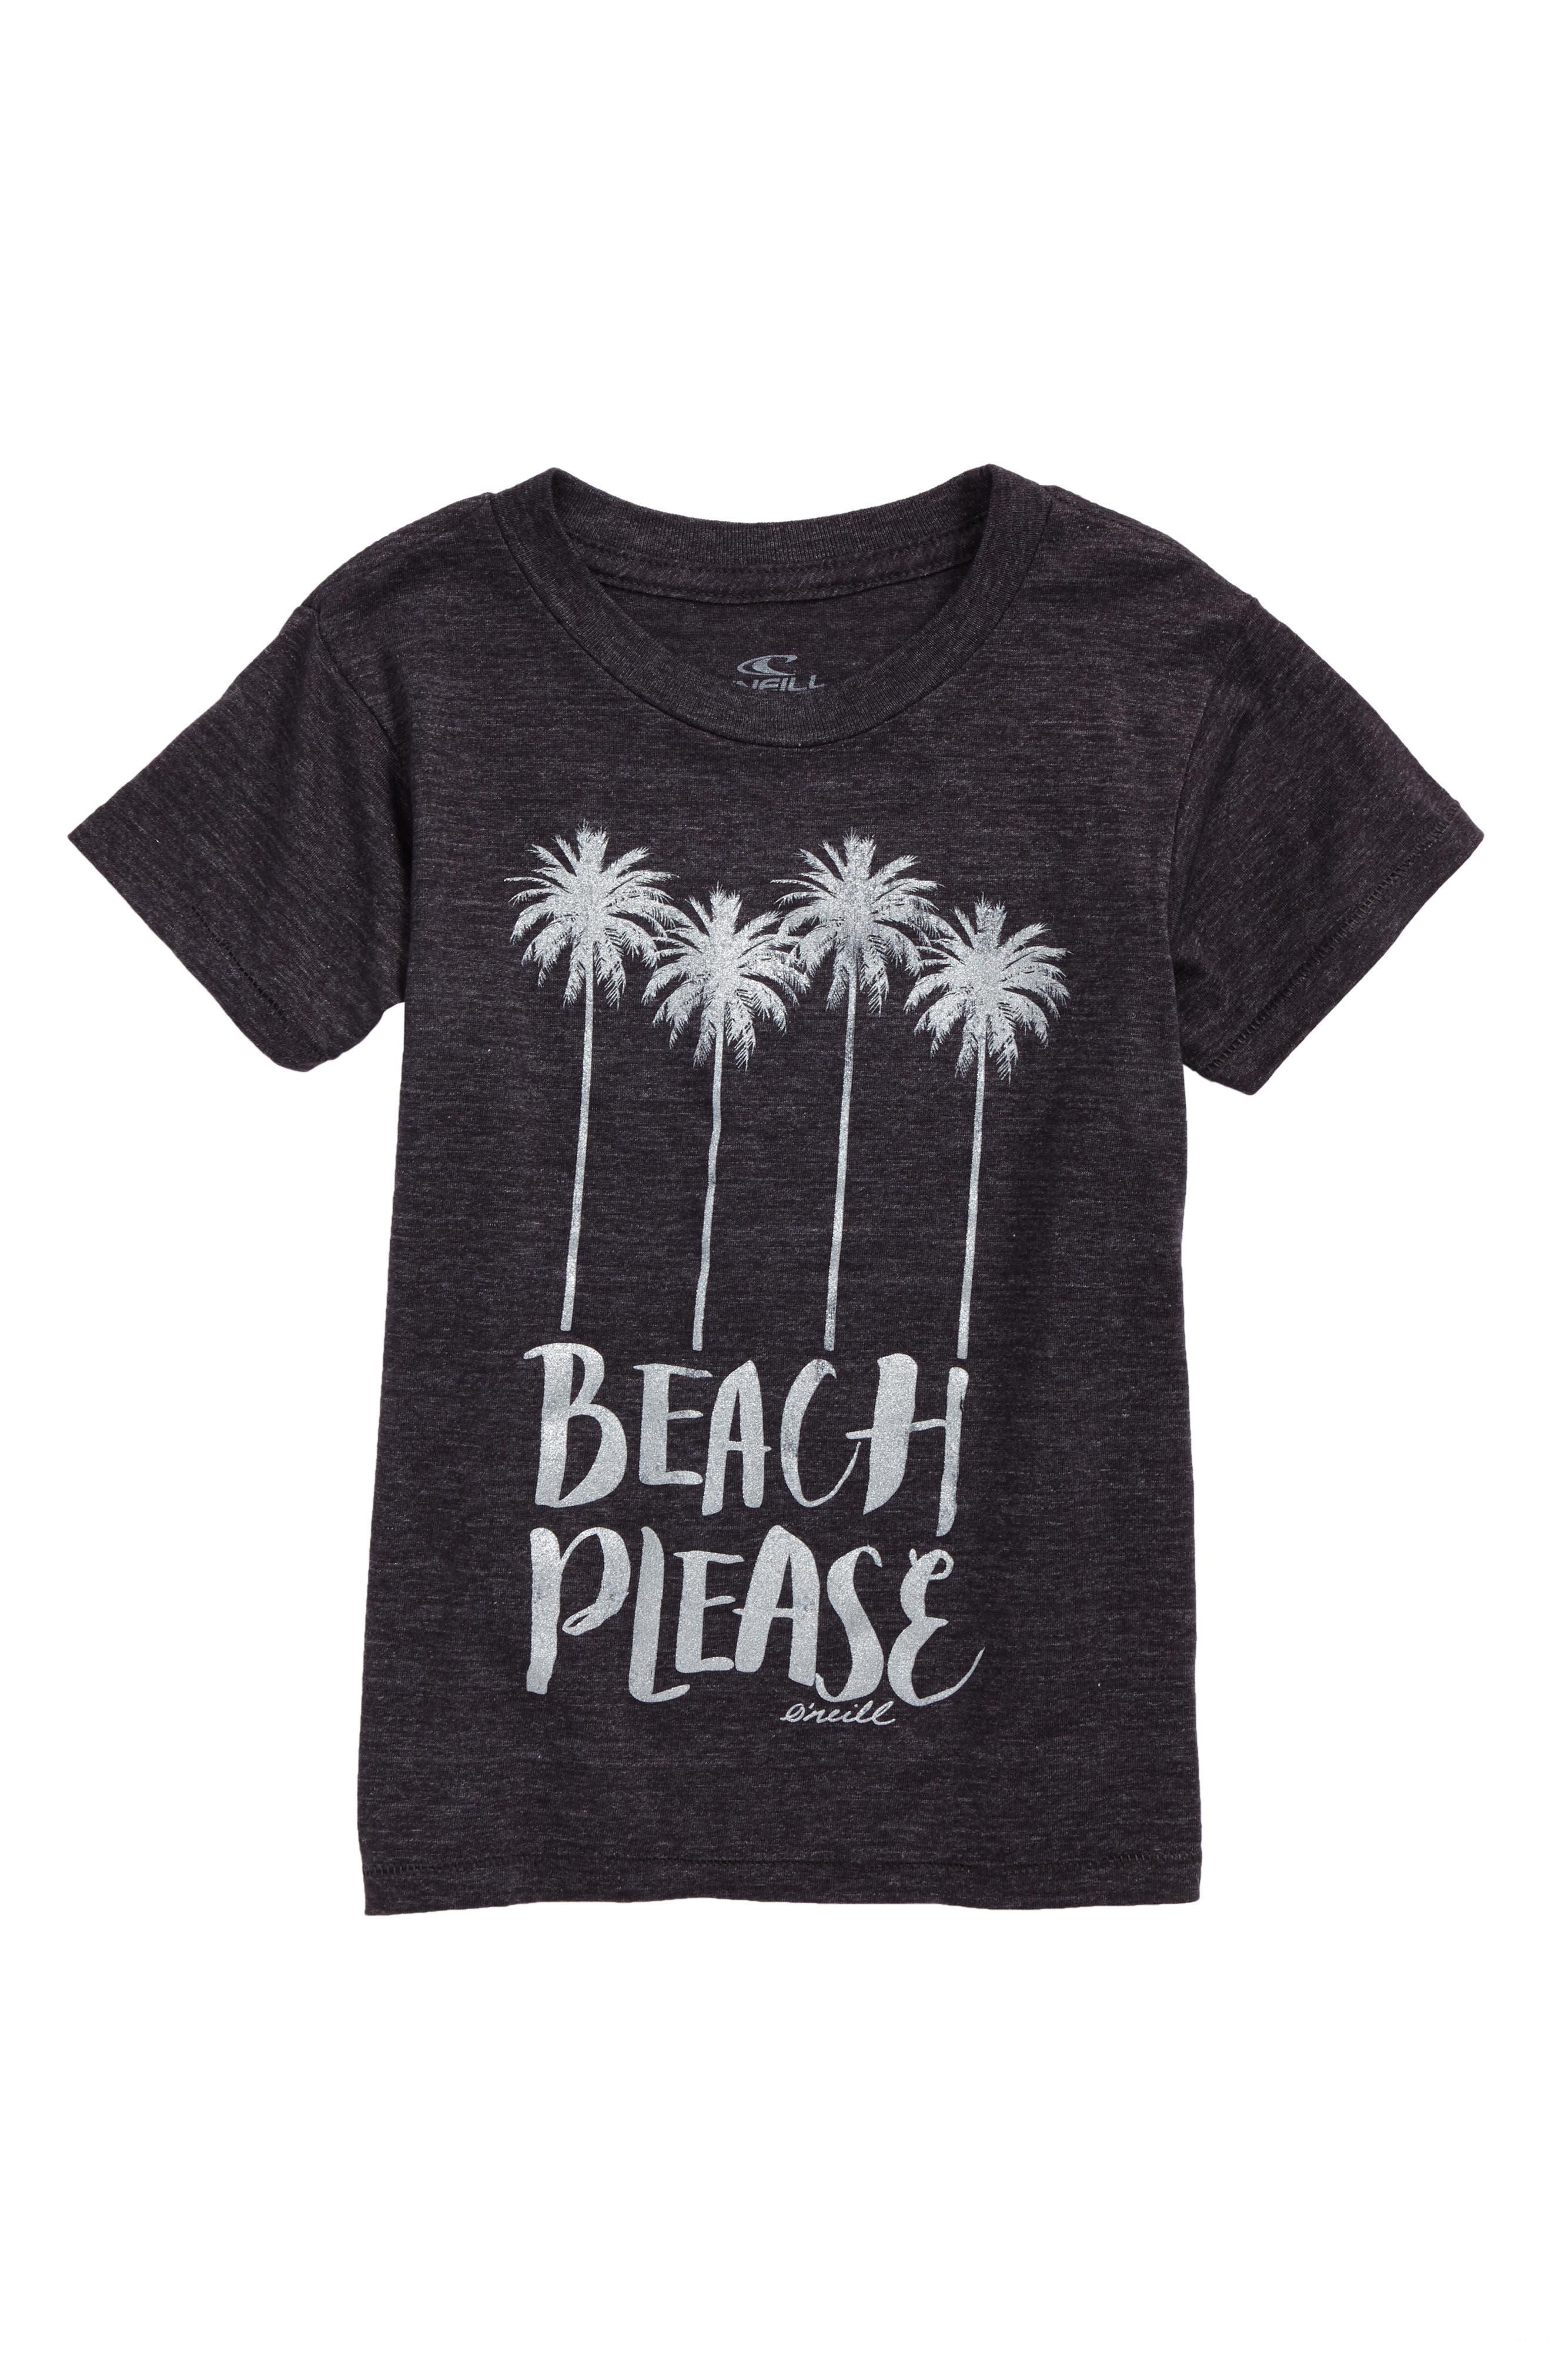 Palm Beach Please Graphic Tee,                         Main,                         color, 026